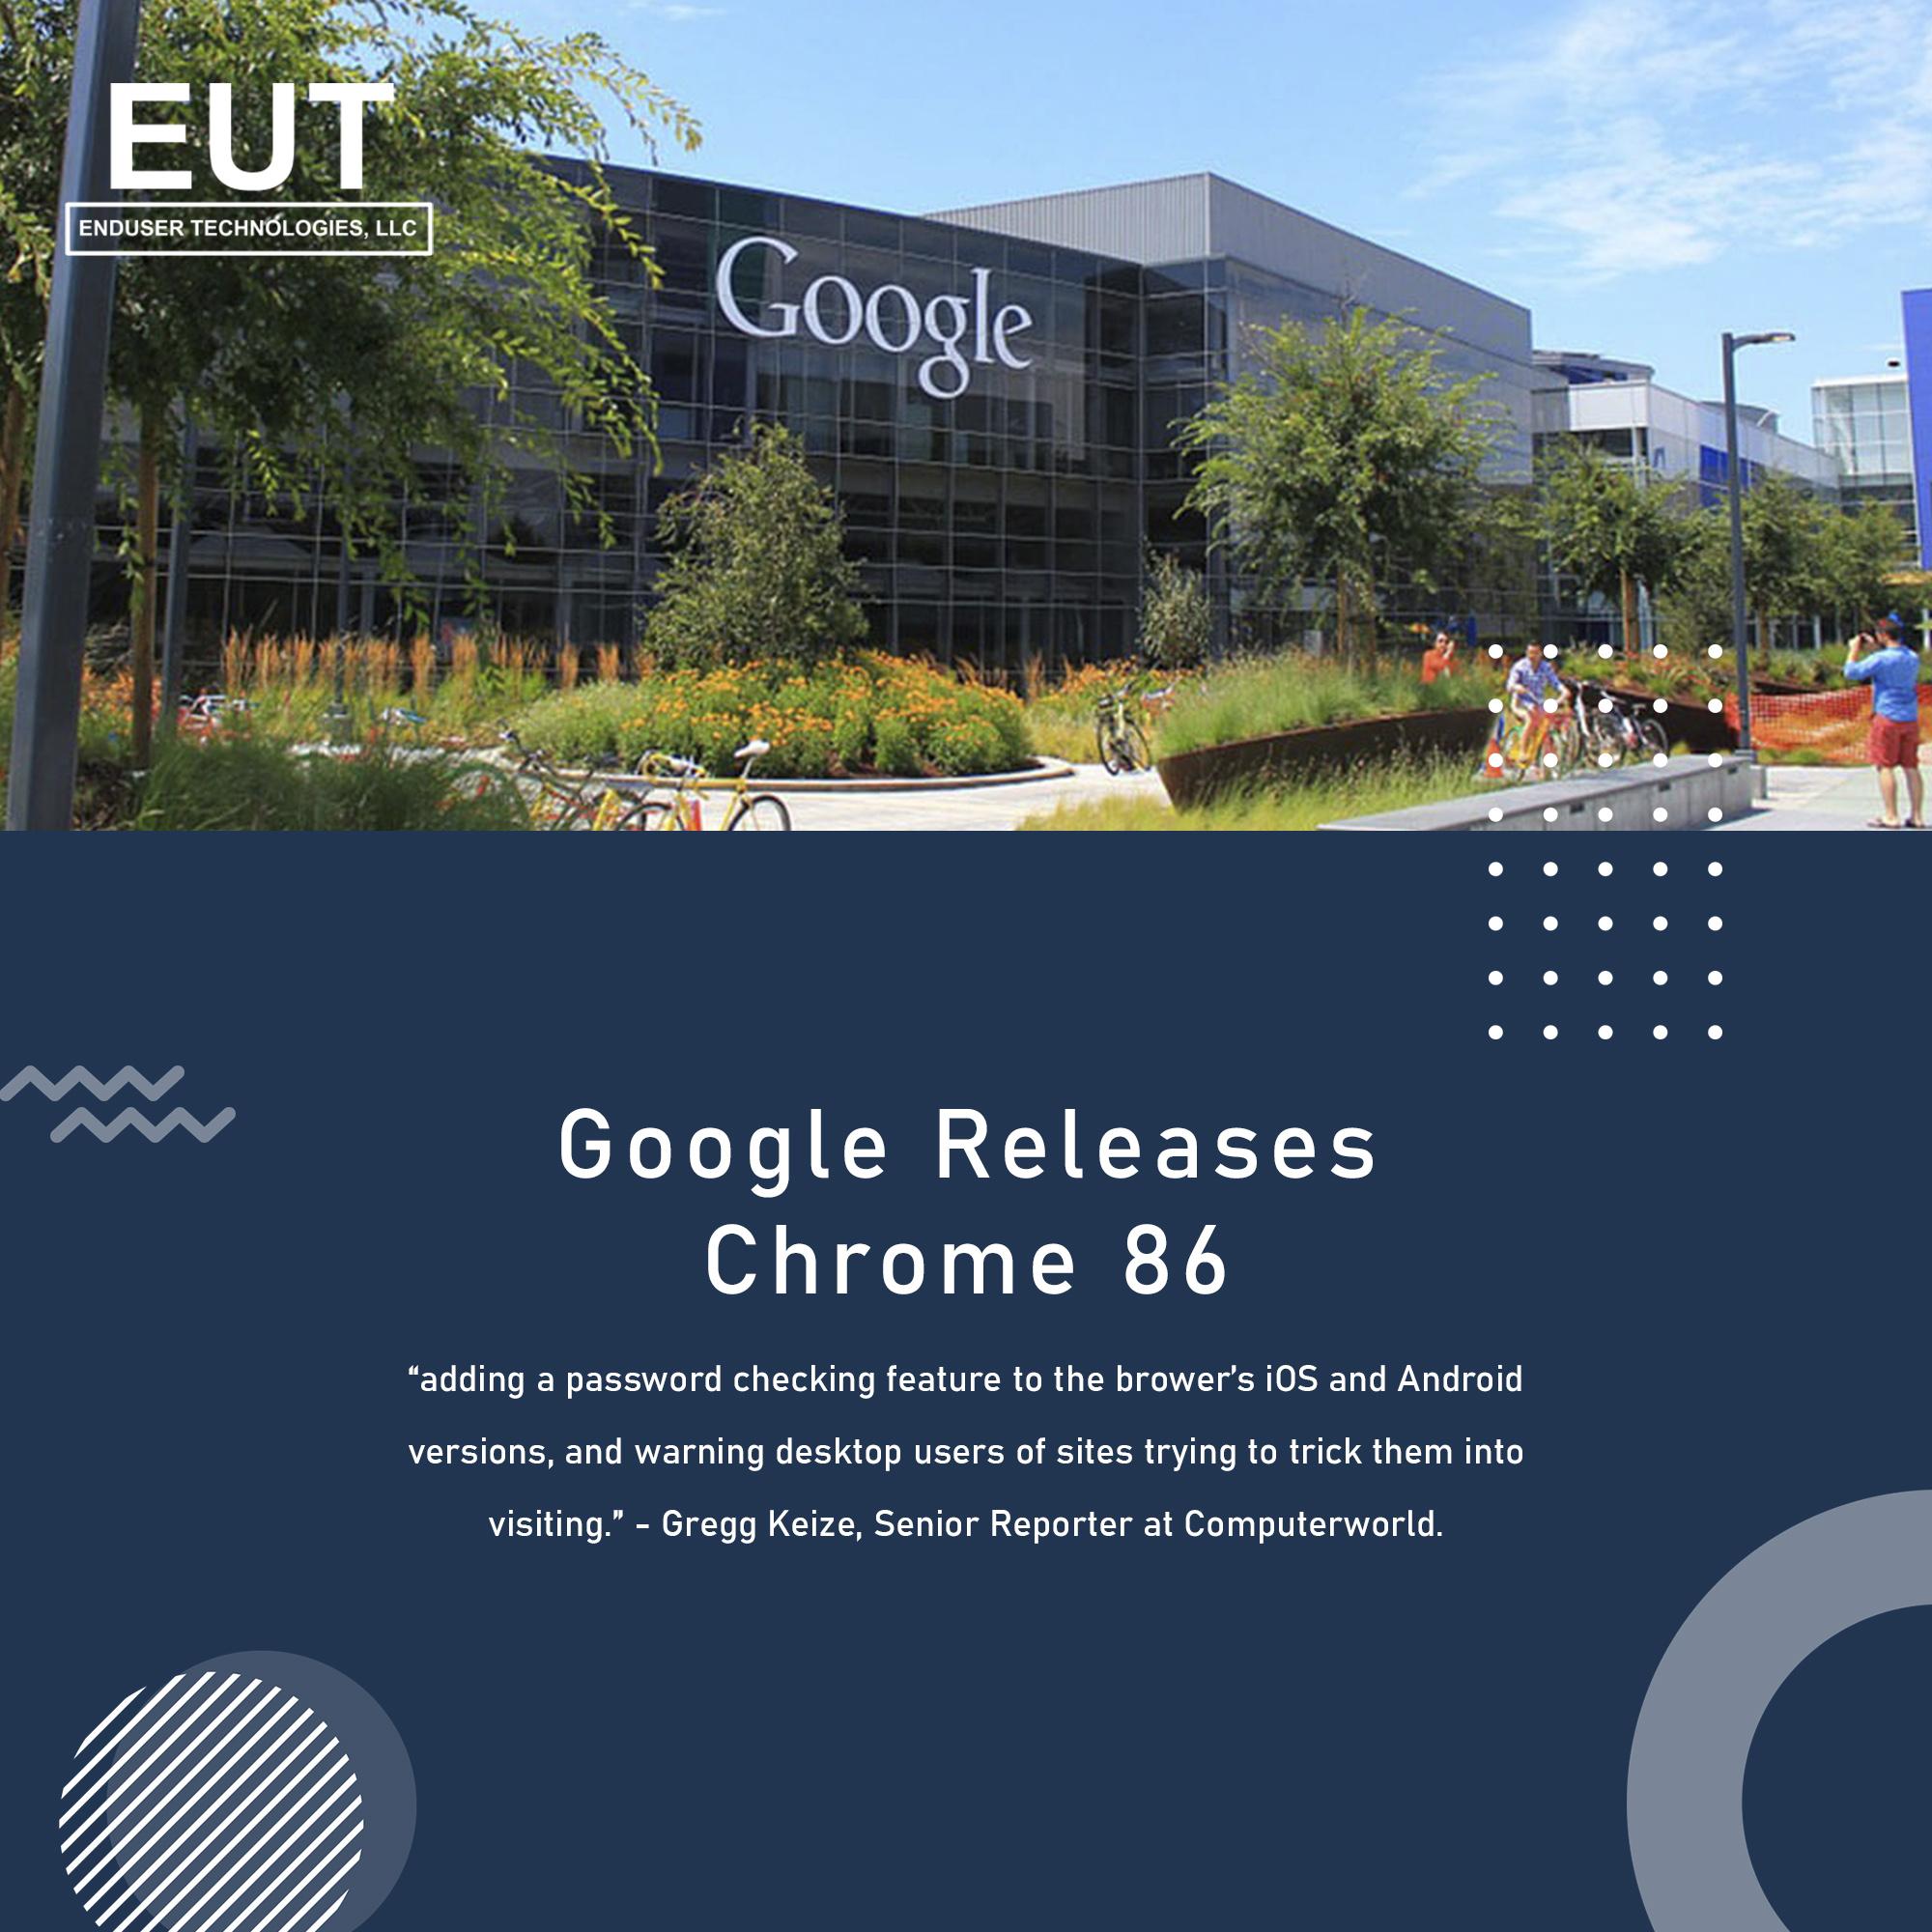 Google Releases Chrome 86